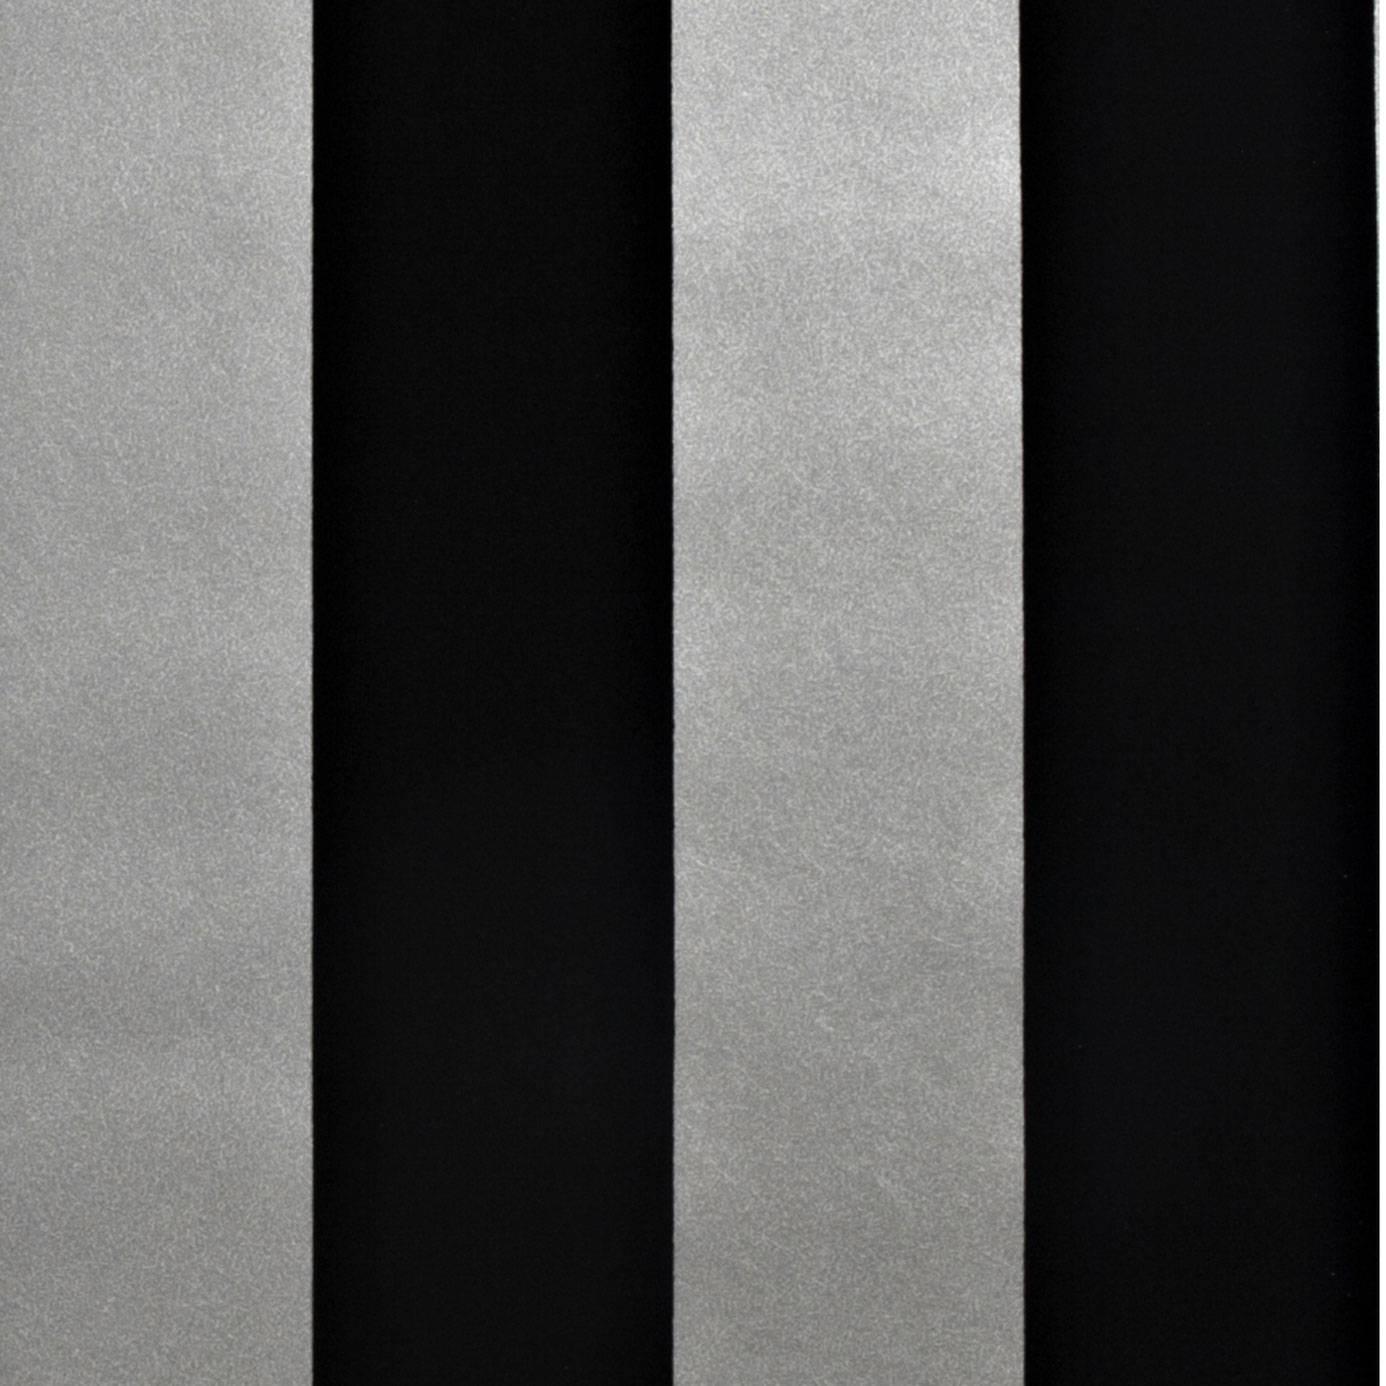 Американские обои Prestigious,  коллекция Vivo, артикул1990-905